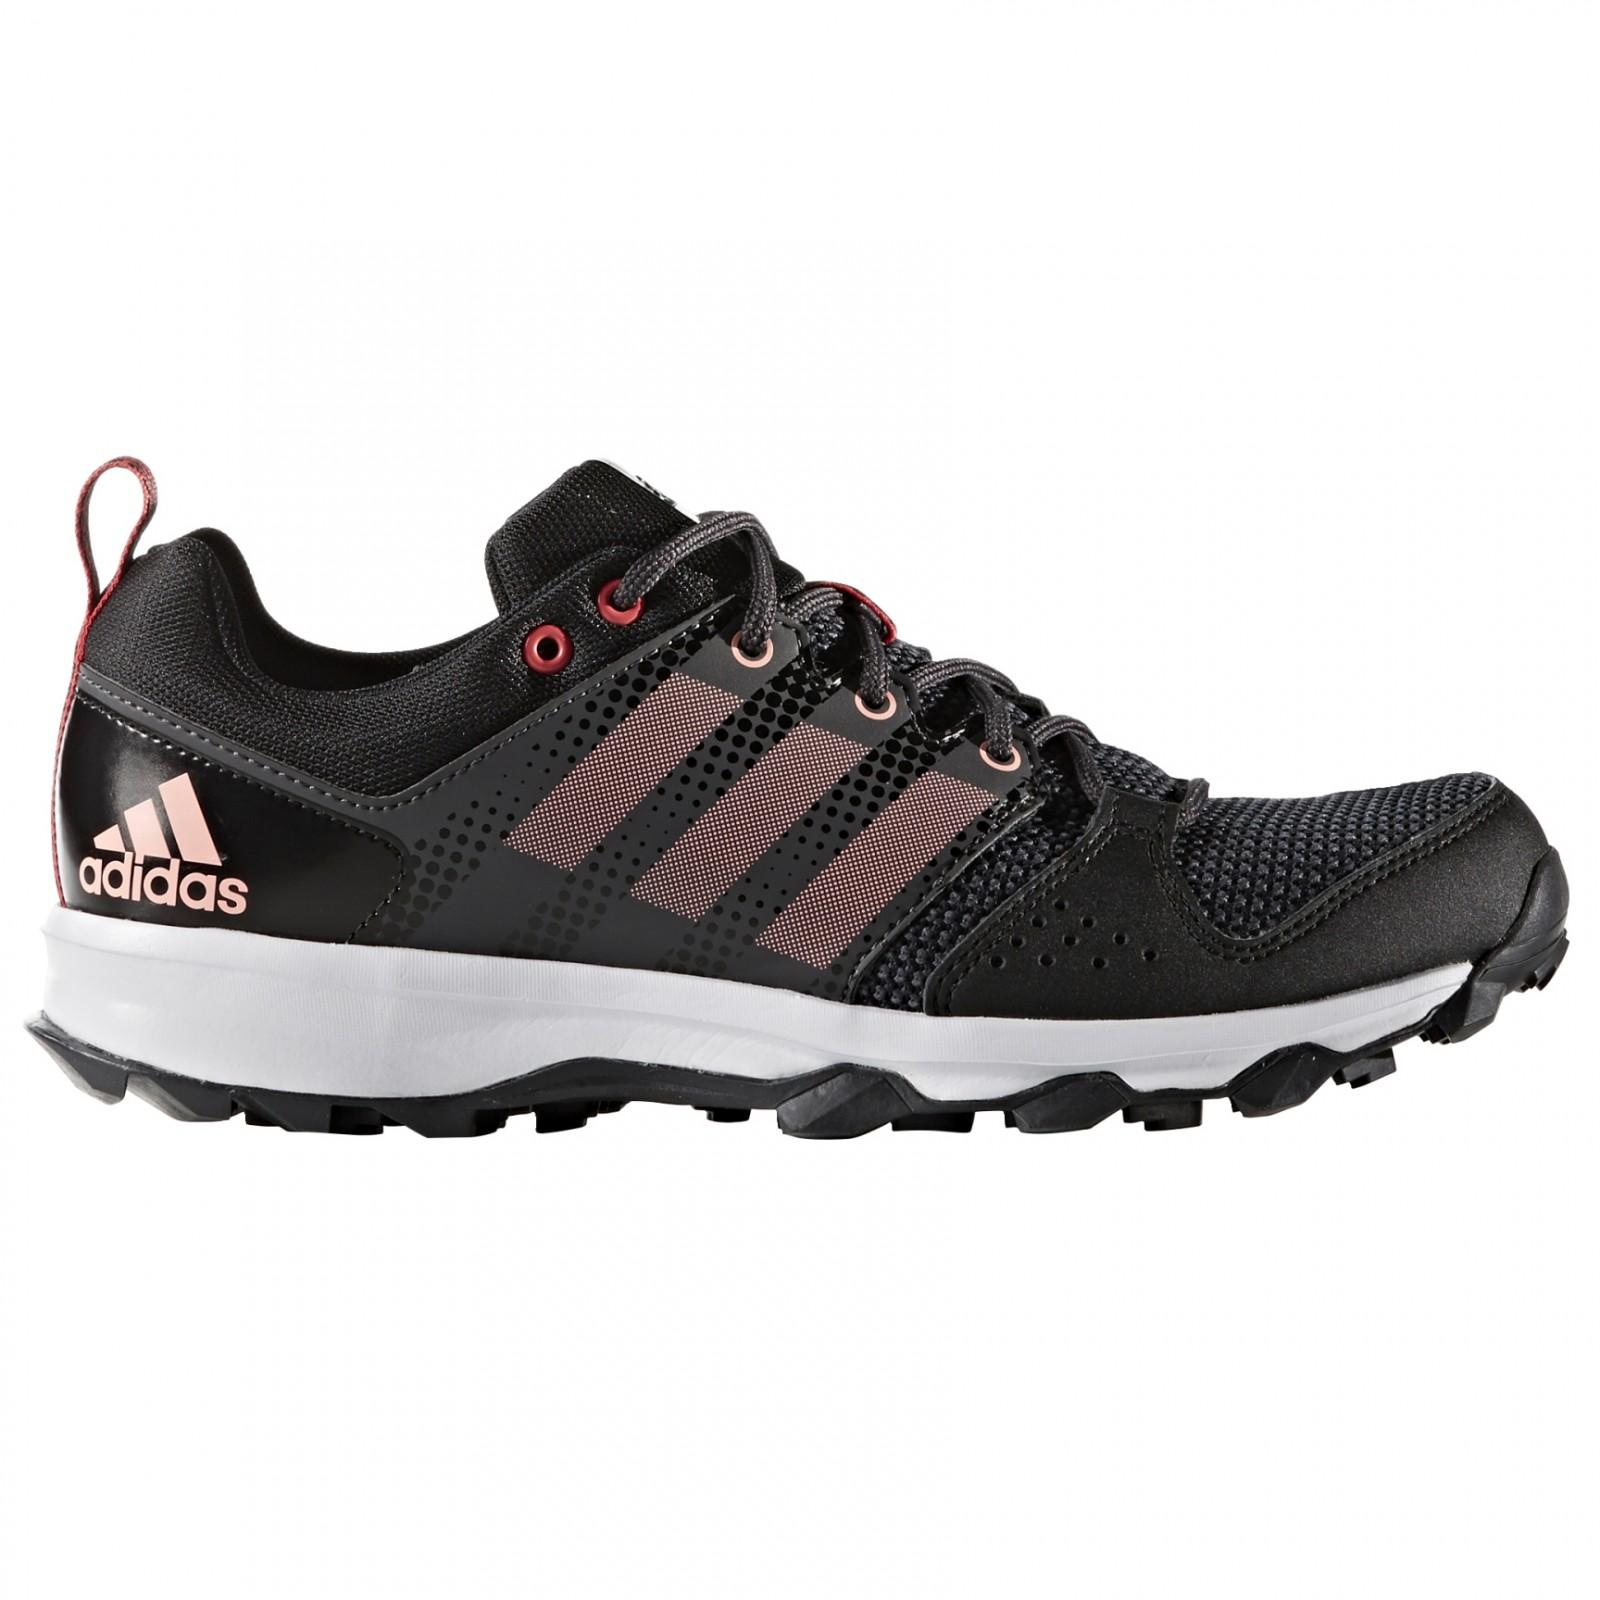 Dámské běžecké boty adidas galaxy trail w